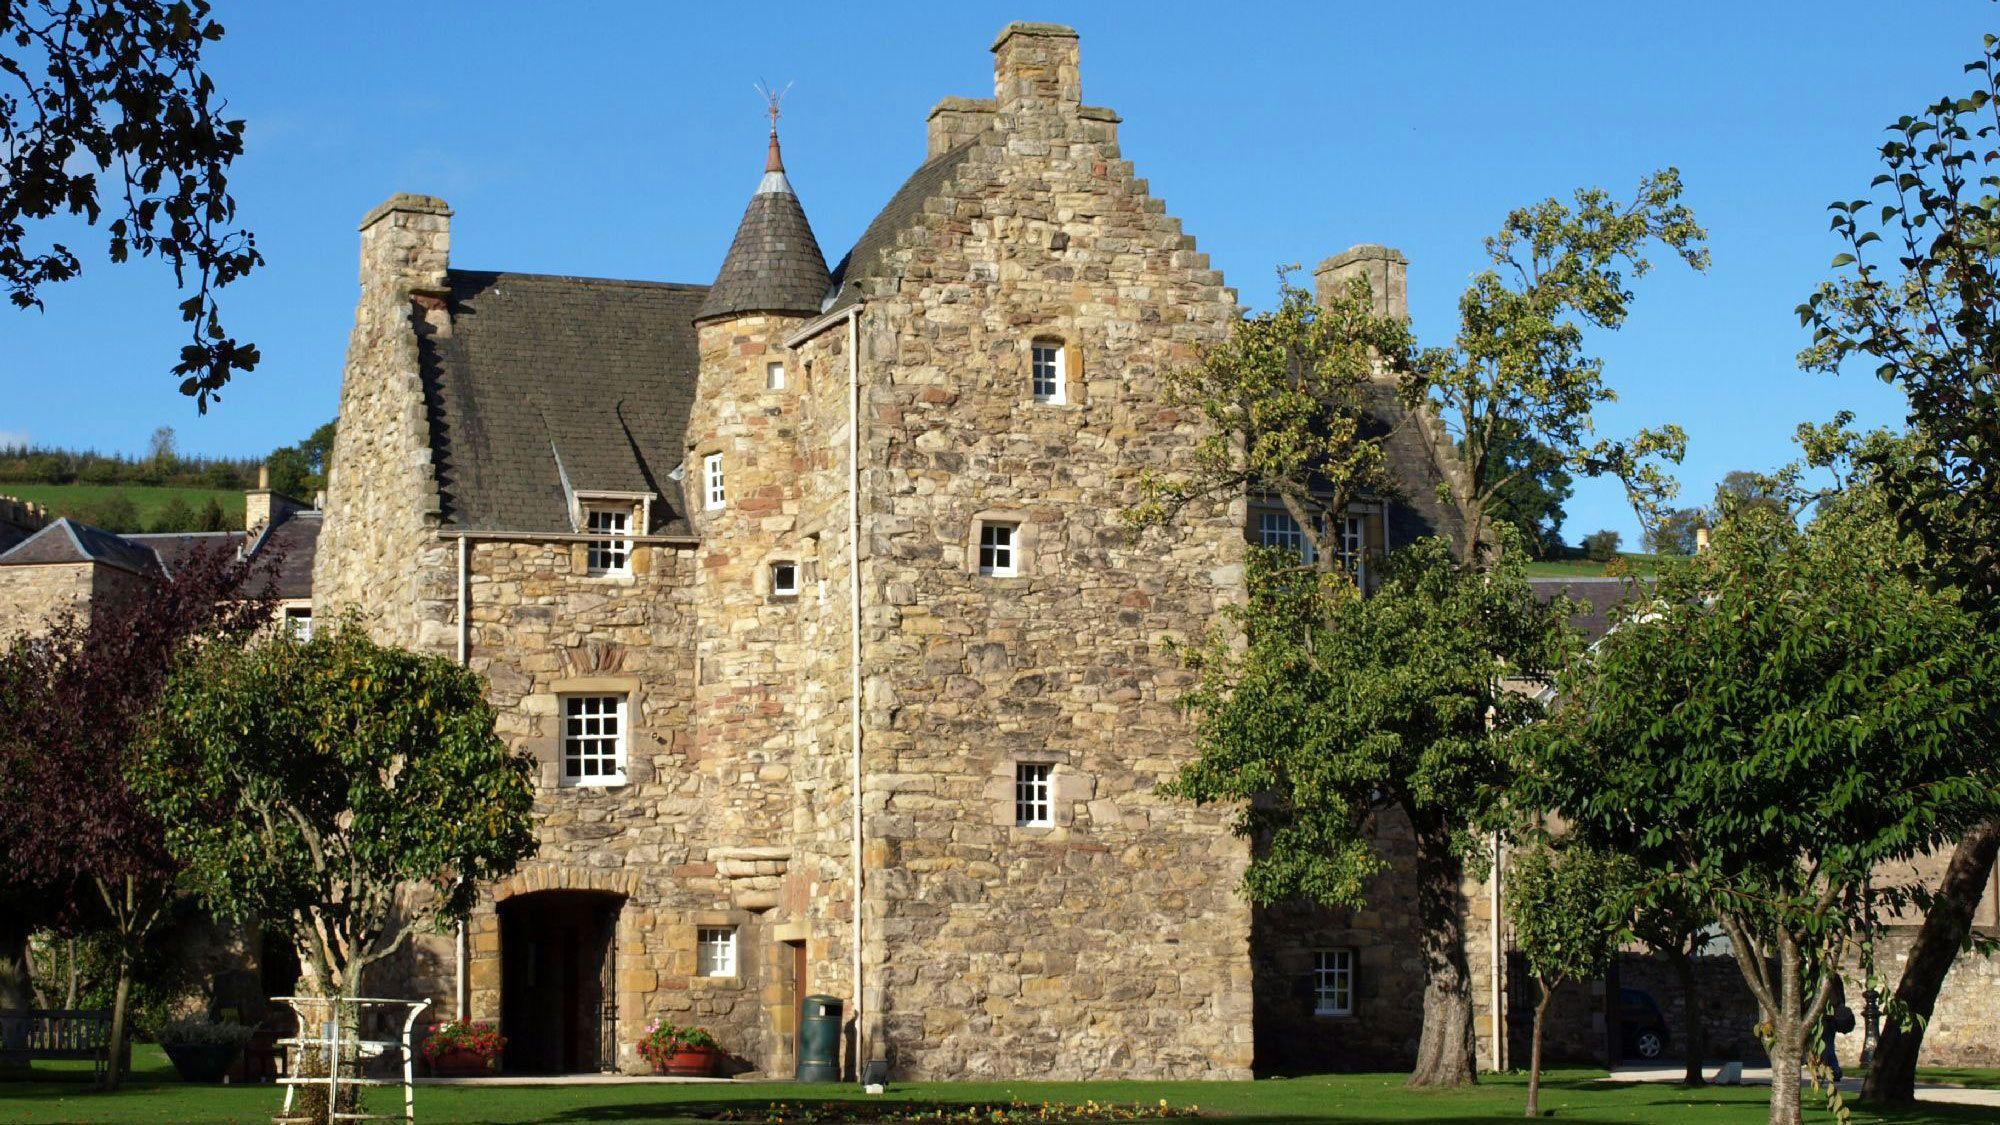 brick house in Edinburgh